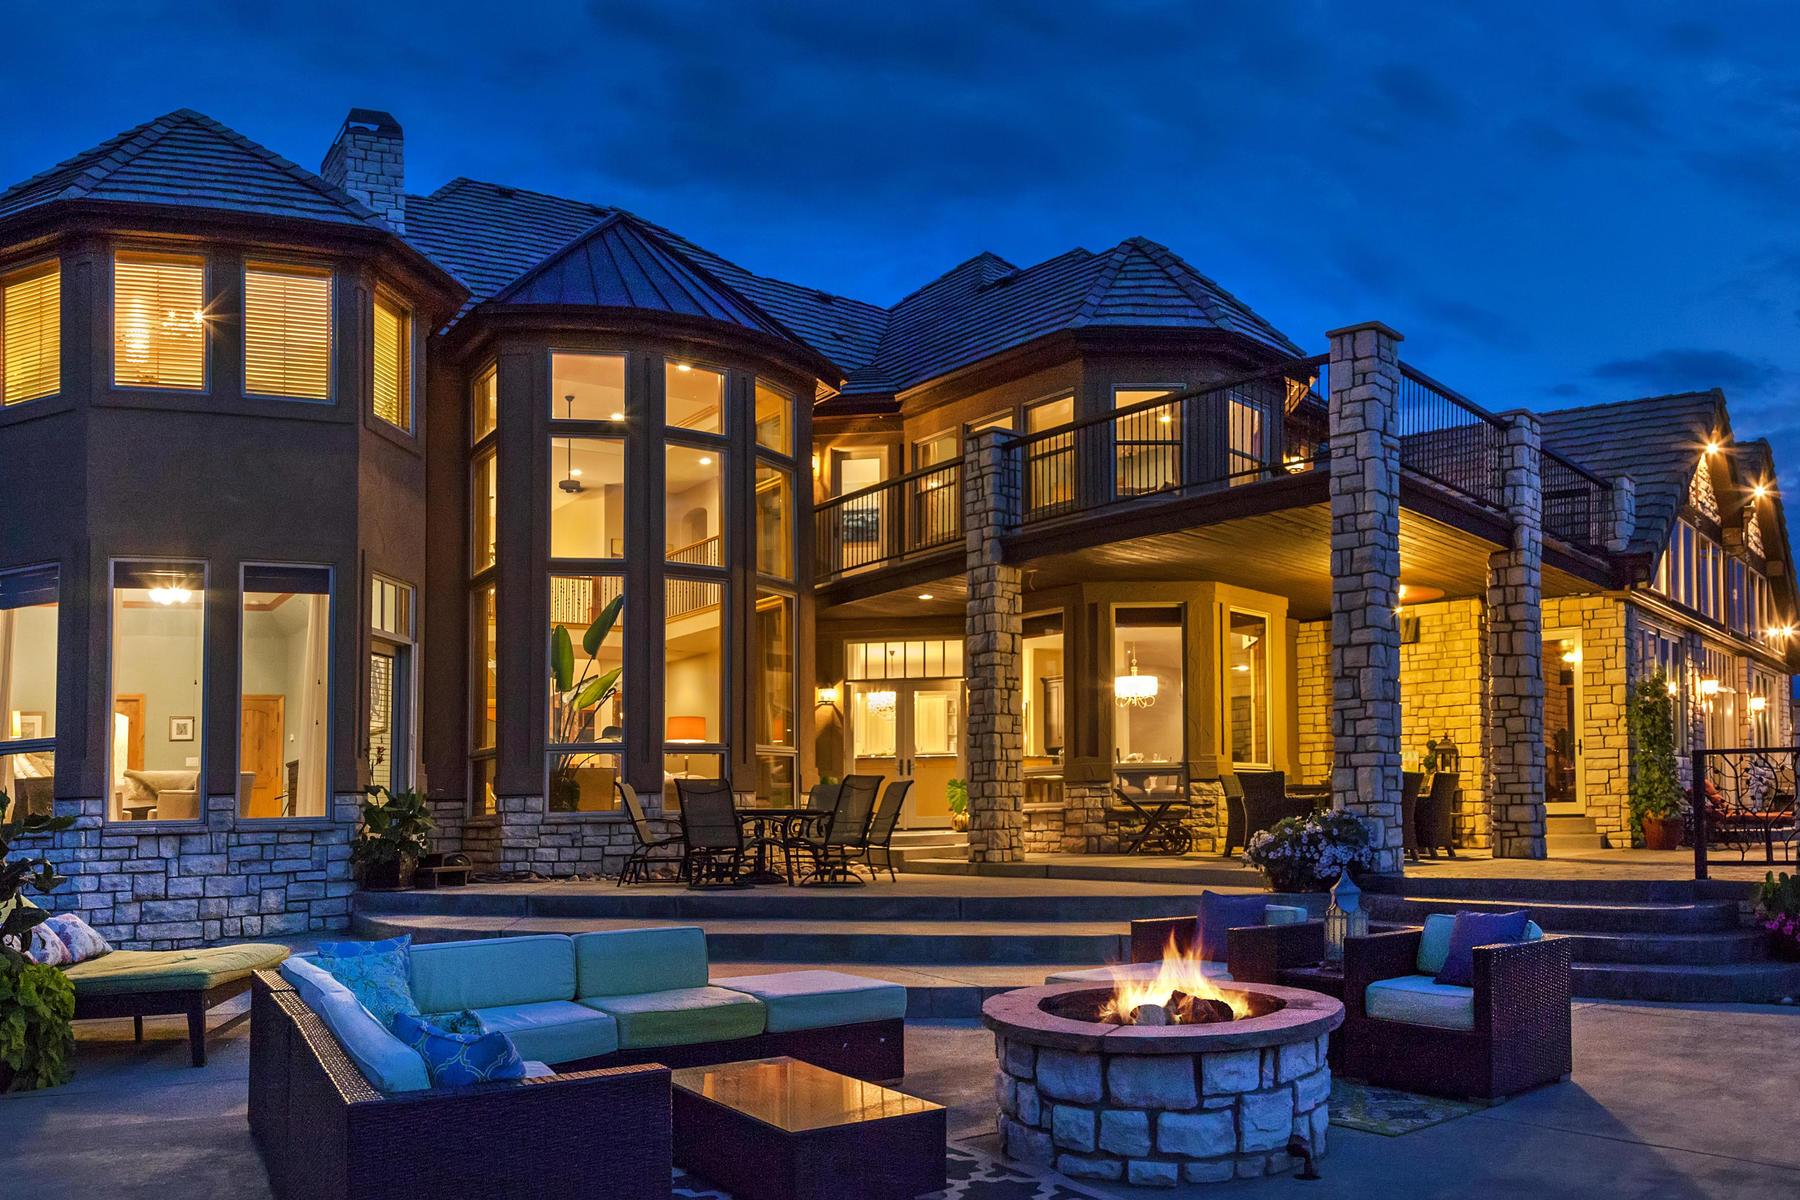 Single Family Home for Sale at Private Lakefront Estate 9841 Shoreline Dr Longmont, Colorado, 80504 United States